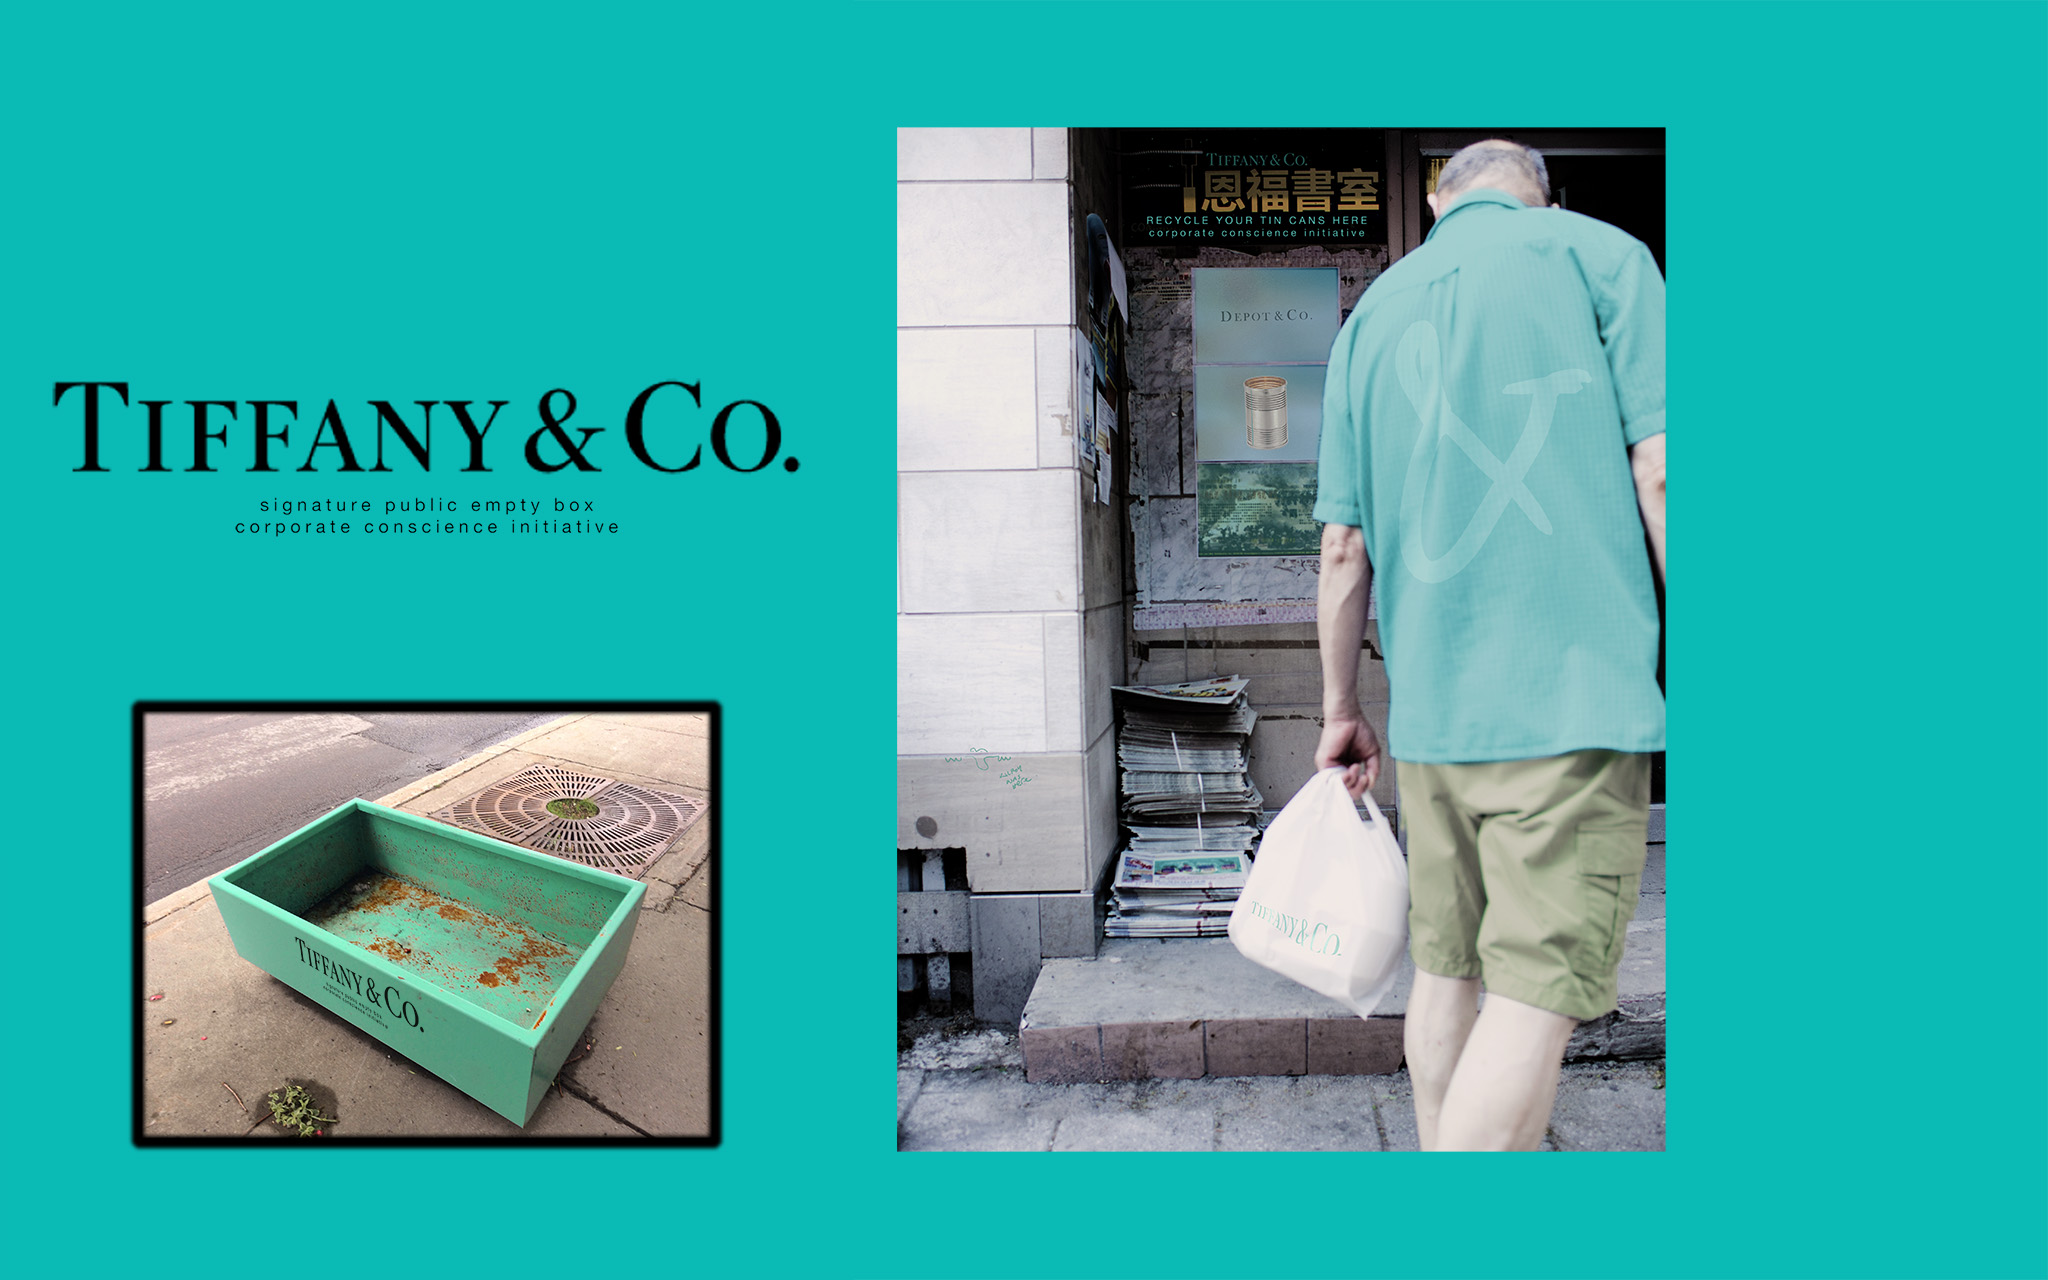 TIFFANY & CO SOCIAL RESPONSIBILITY DEPOT.jpg